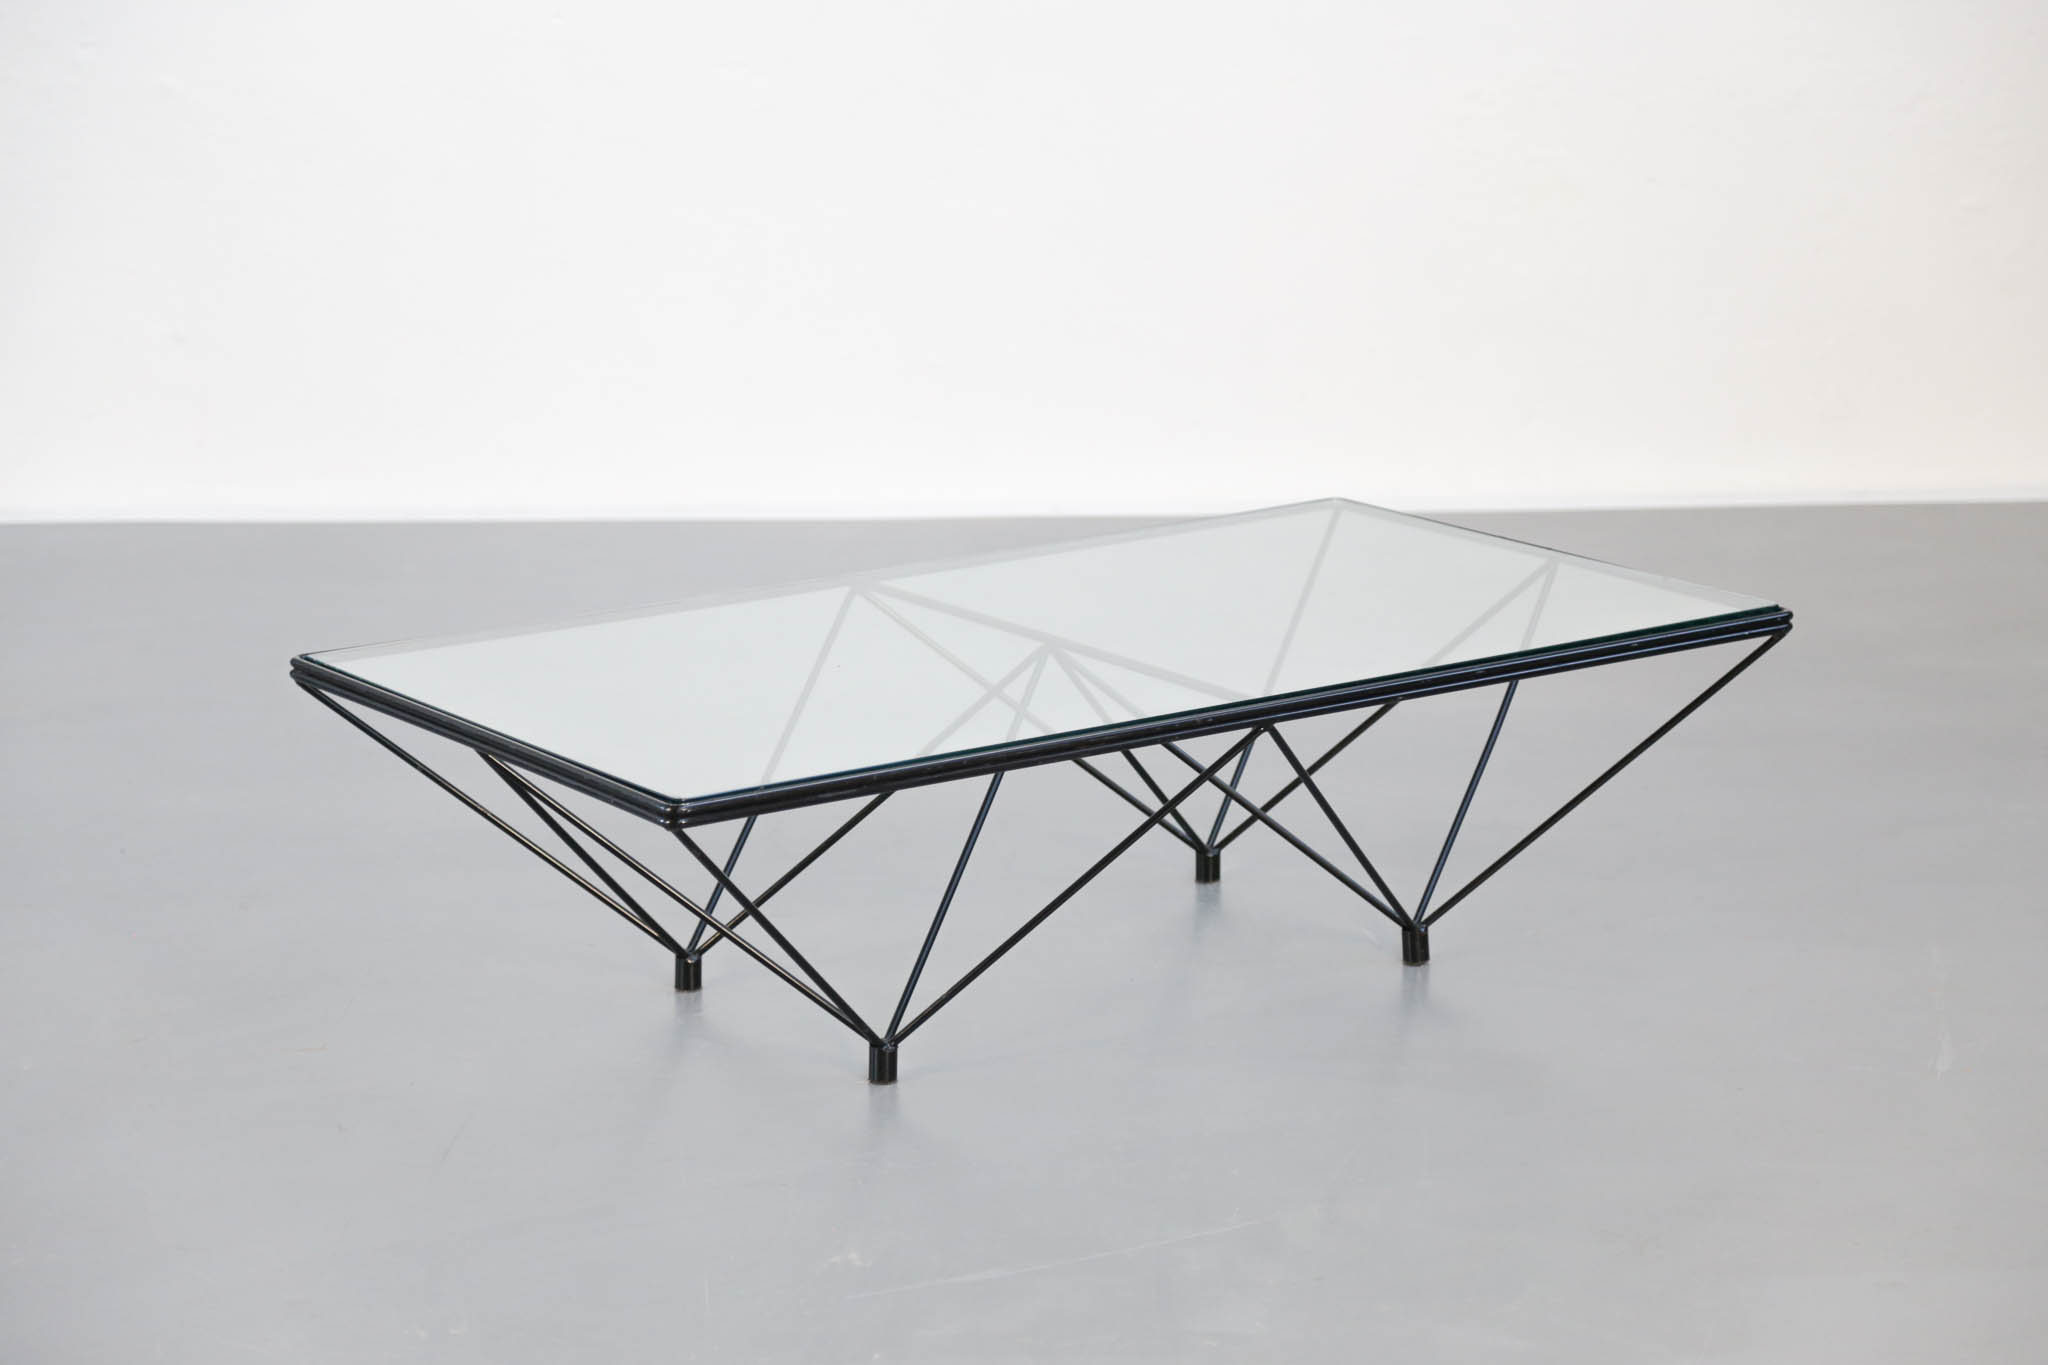 Table Basse Design Italien Excellent Best Great Tables